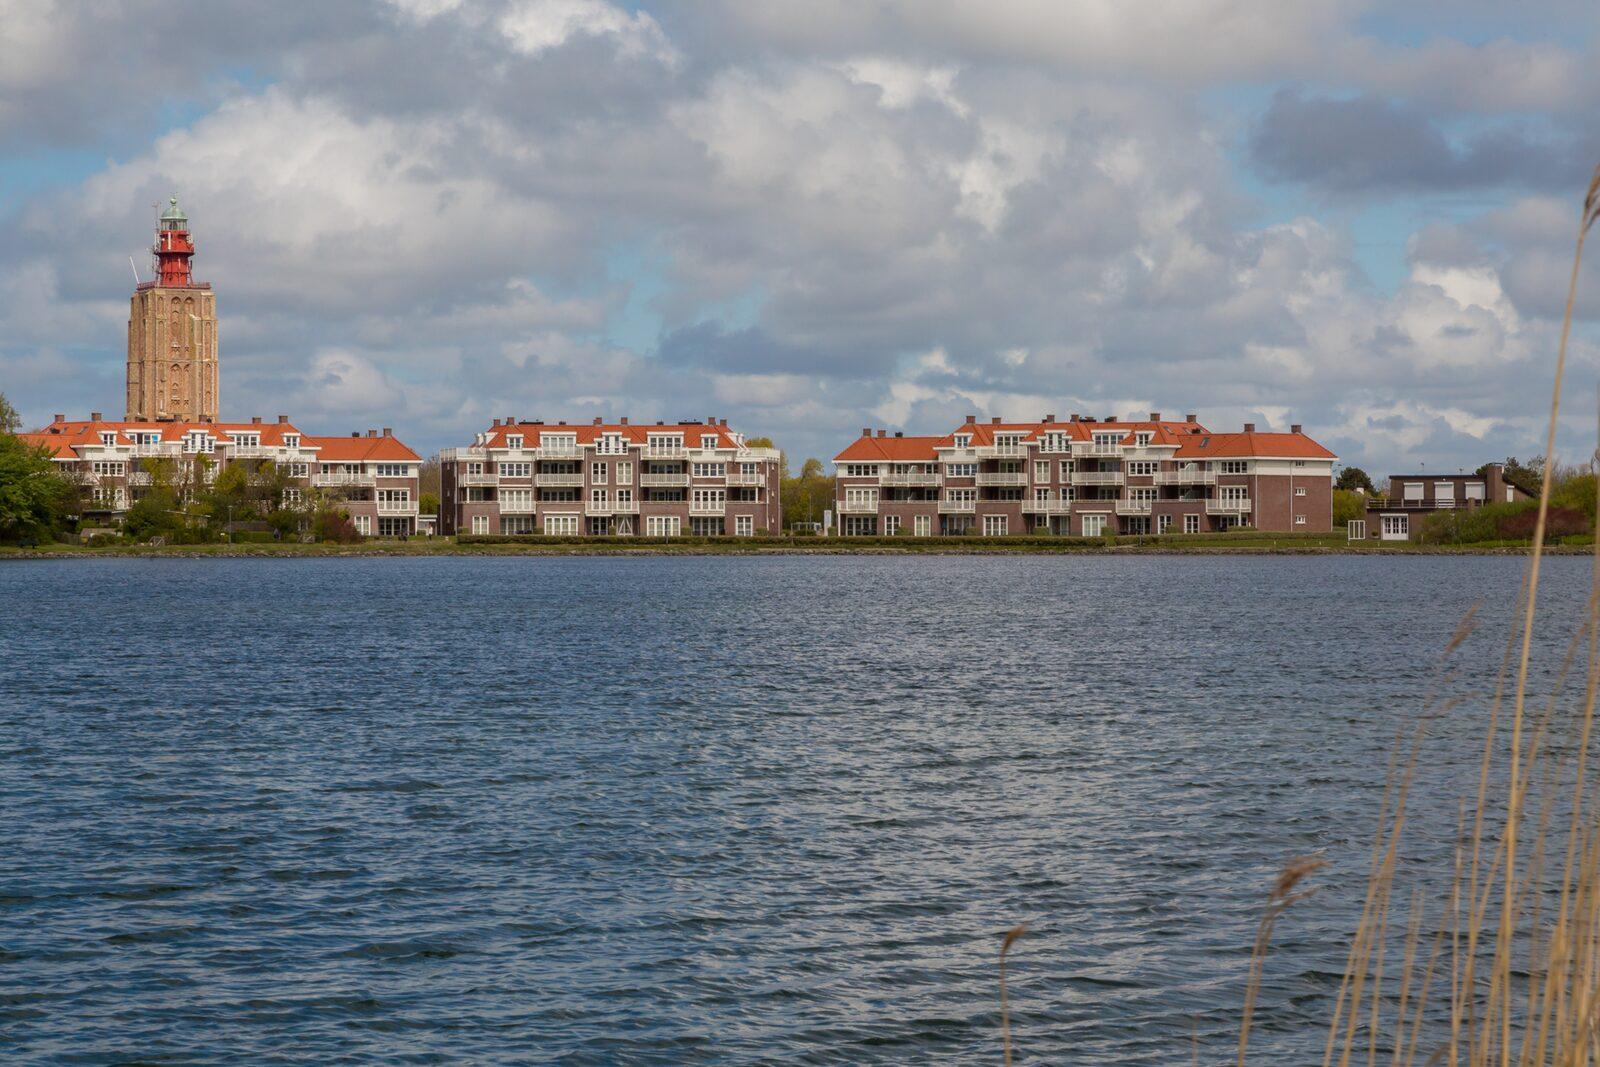 Holidayhouse - Piet Mondriaanpad 6a | Westkapelle